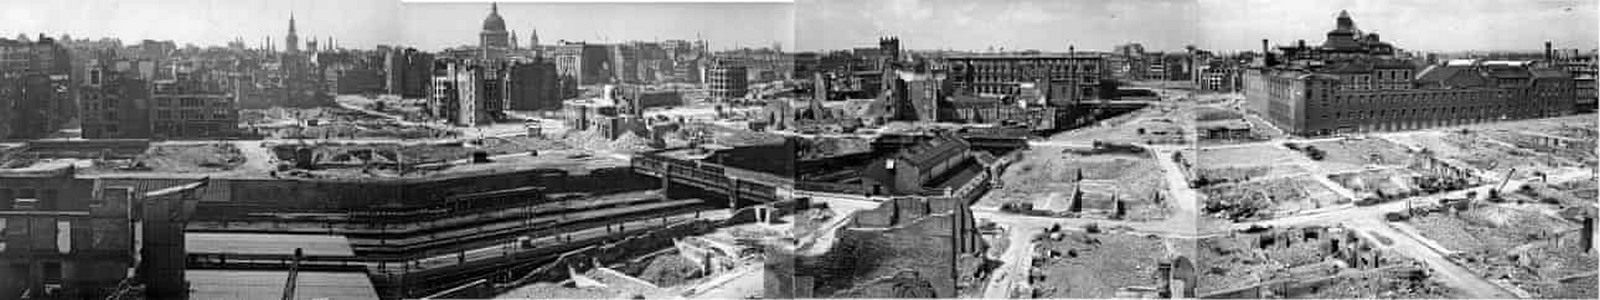 Rebuilding Cities London - Sheet1